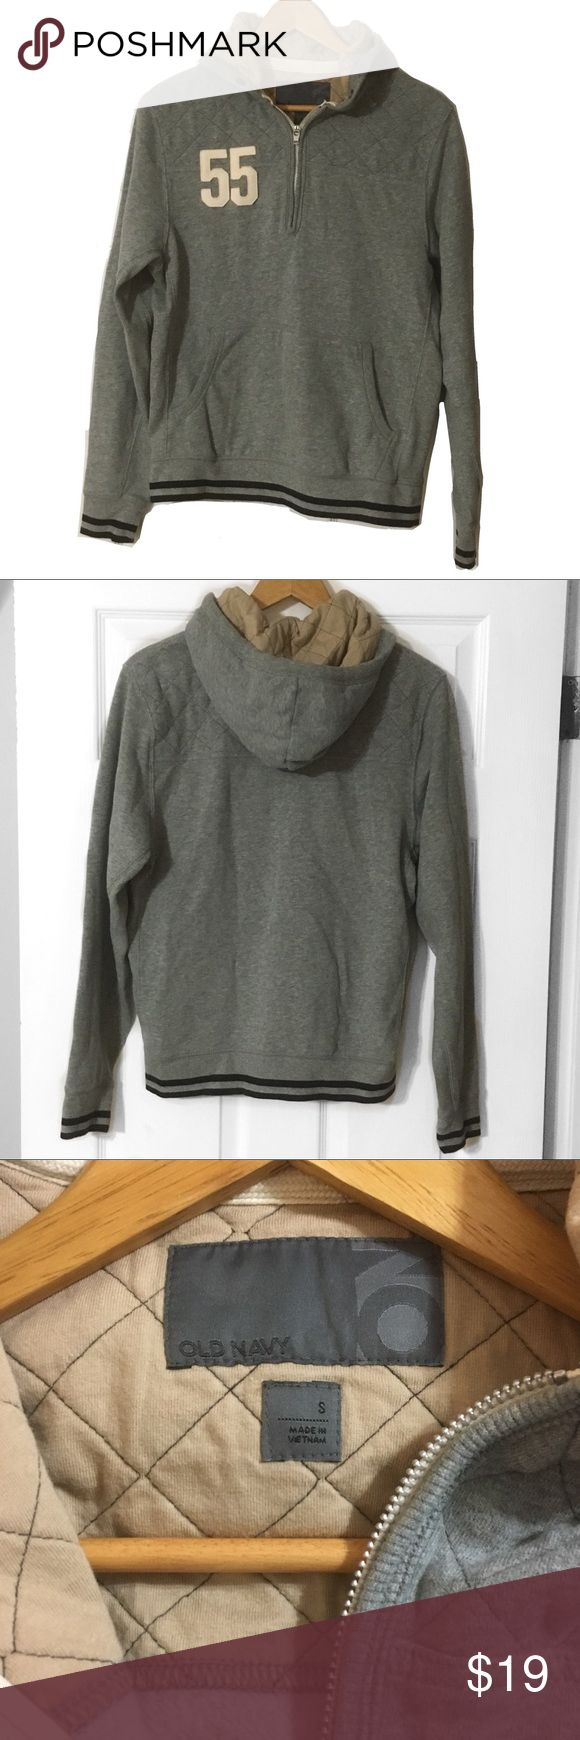 Old Navy 1/4 zip hoodie 1/4 zip hoodie, Old Navy. Size S. Used condition. Shoulders and inside hood is quilted. Old Navy Shirts Sweatshirts & Hoodies